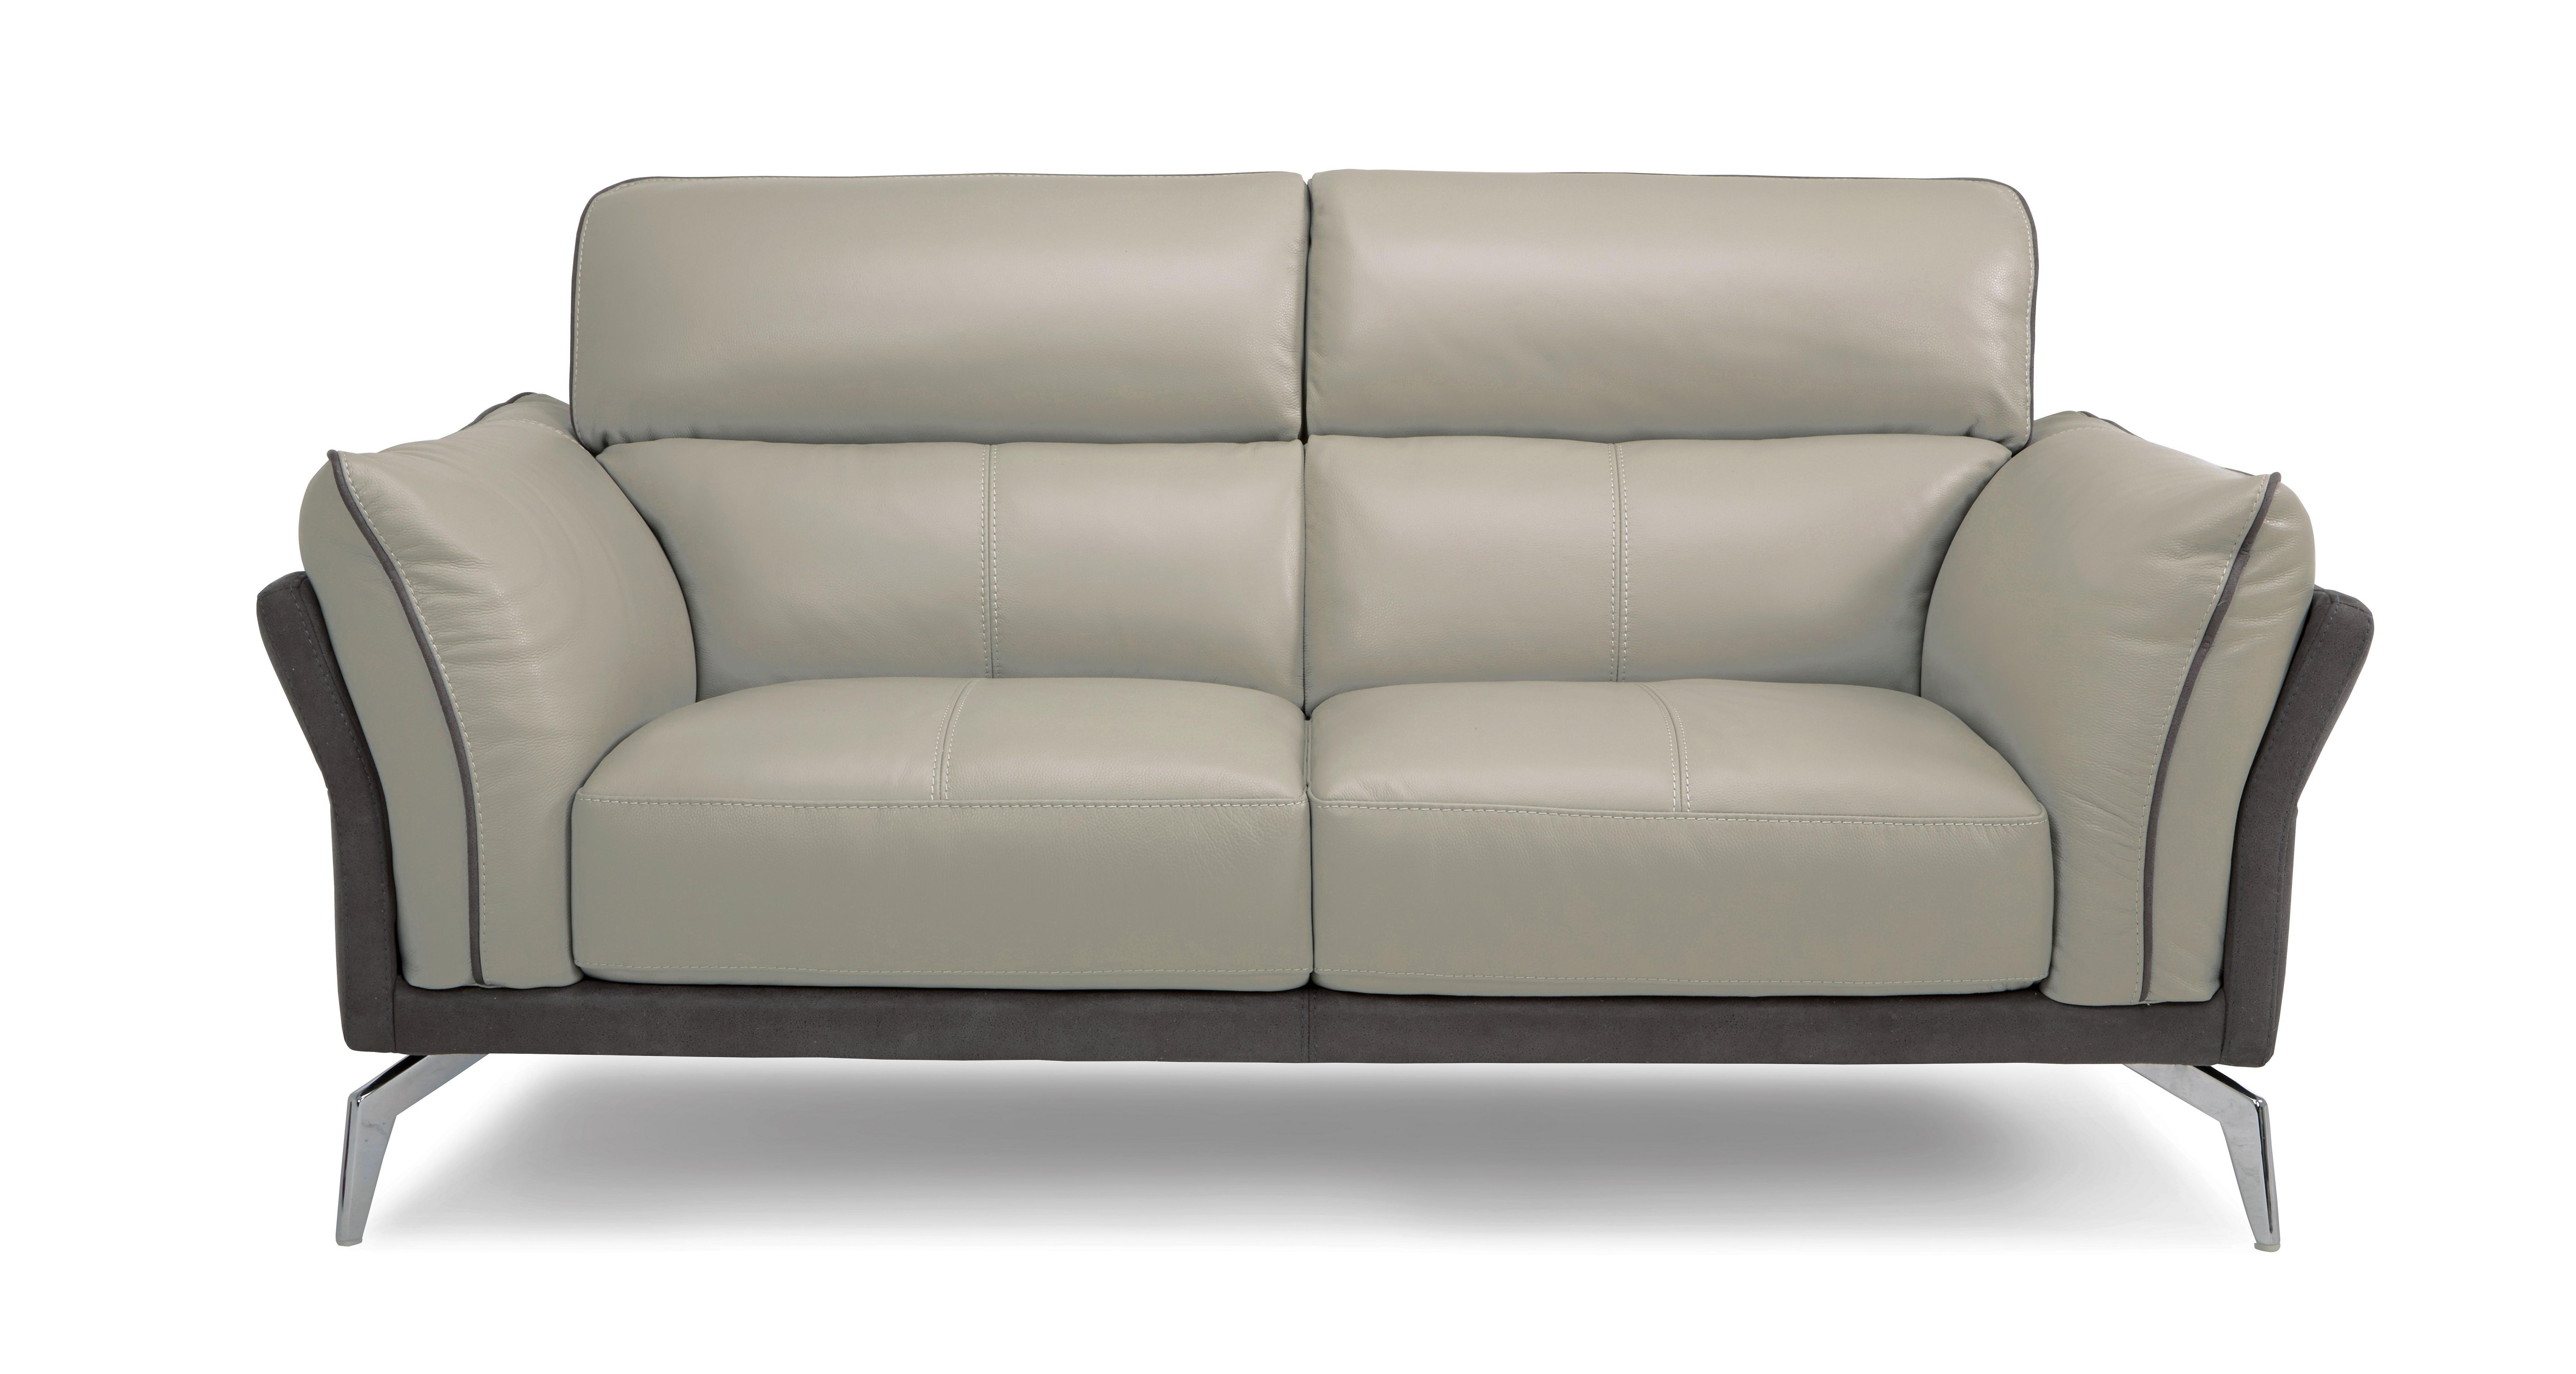 Valdez 2 Seater Sofa New Club DFS Ireland